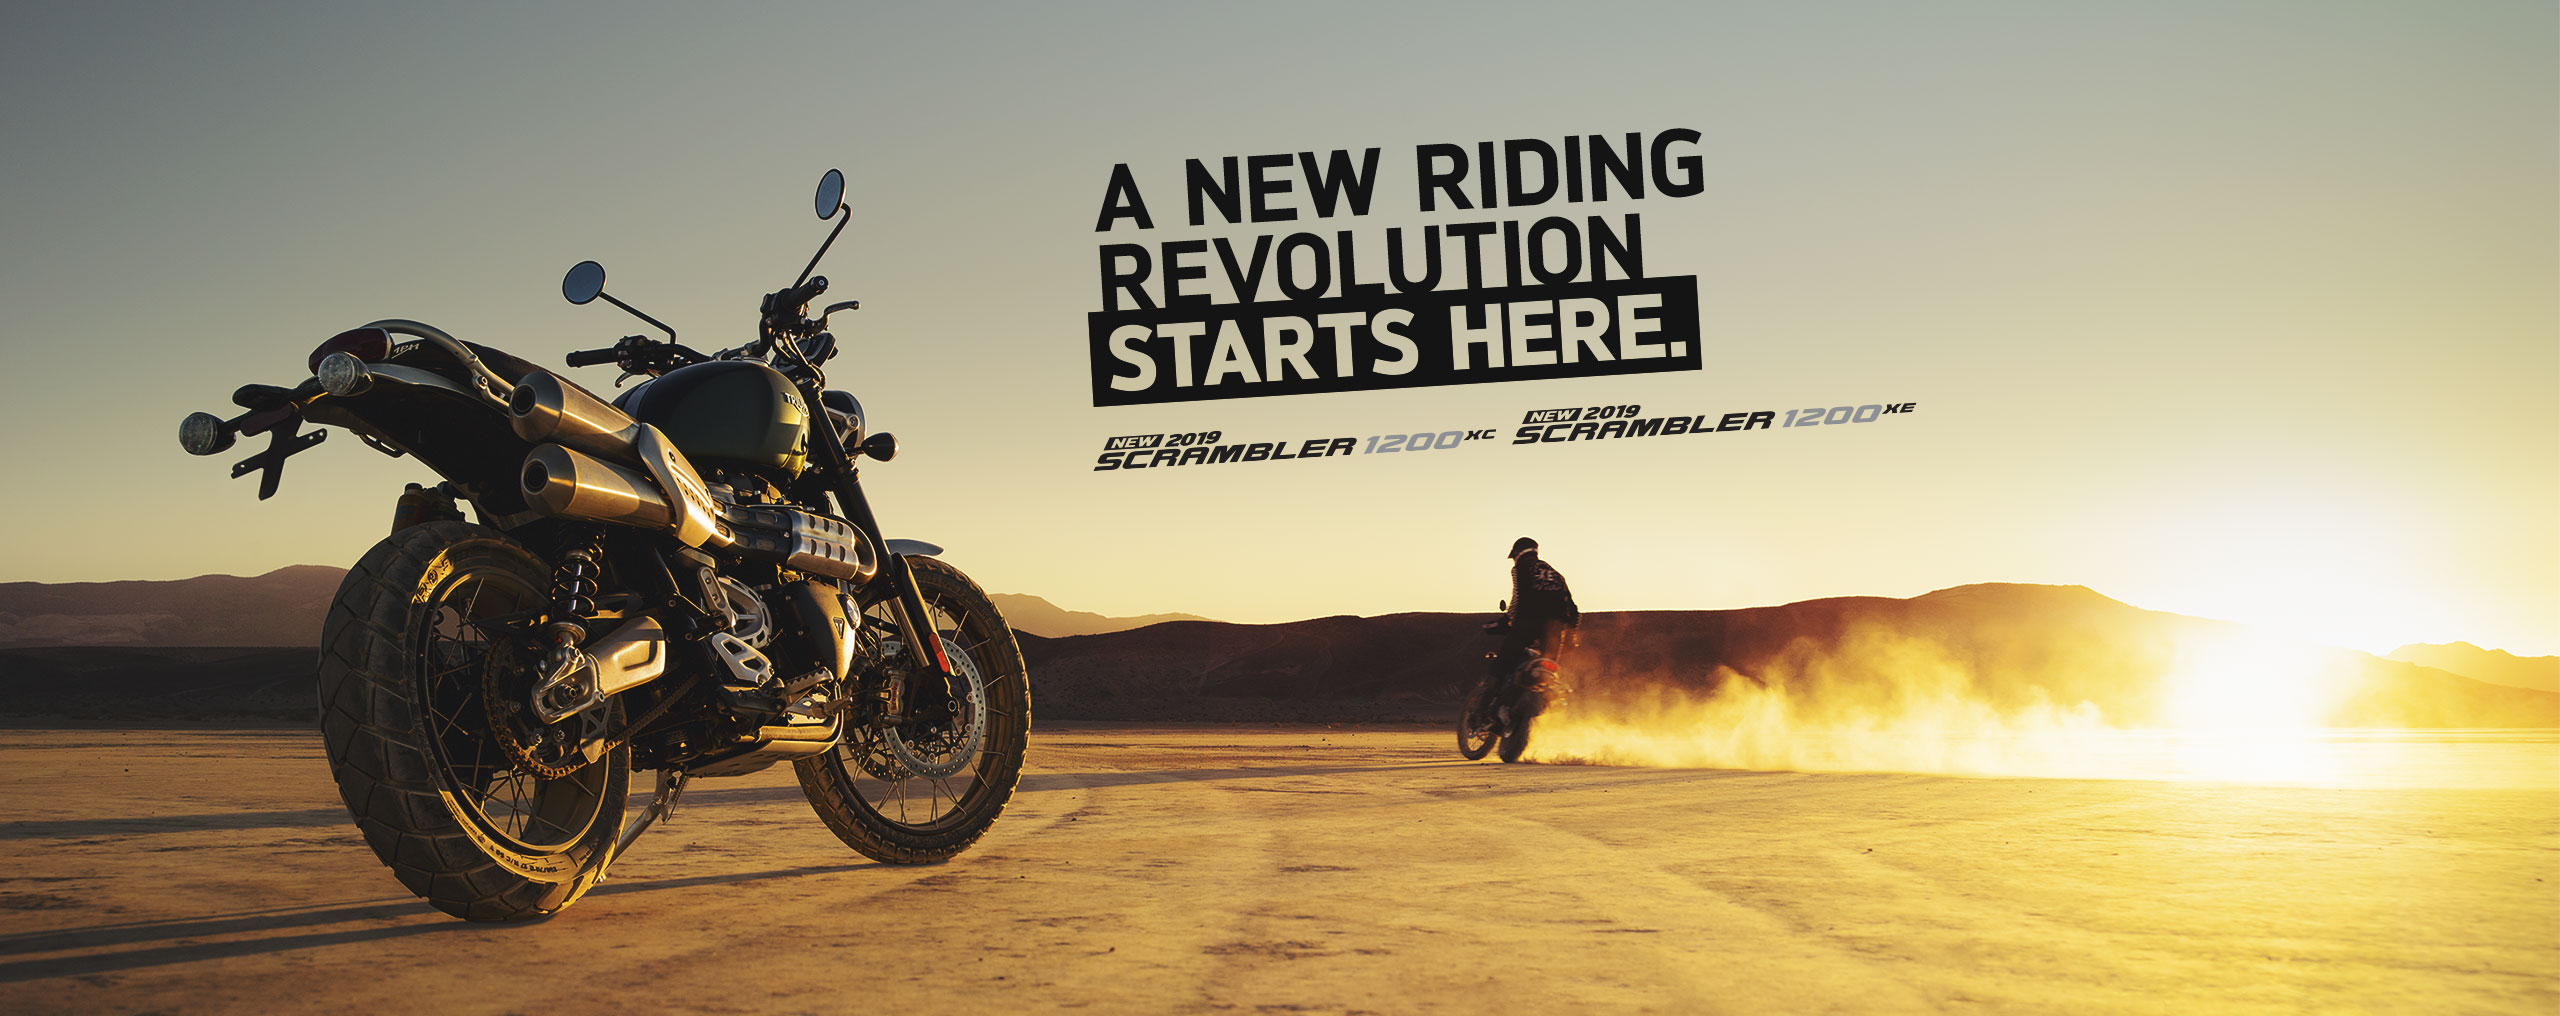 Triumph Motorcycles Phillip Mccallen Motorcycles